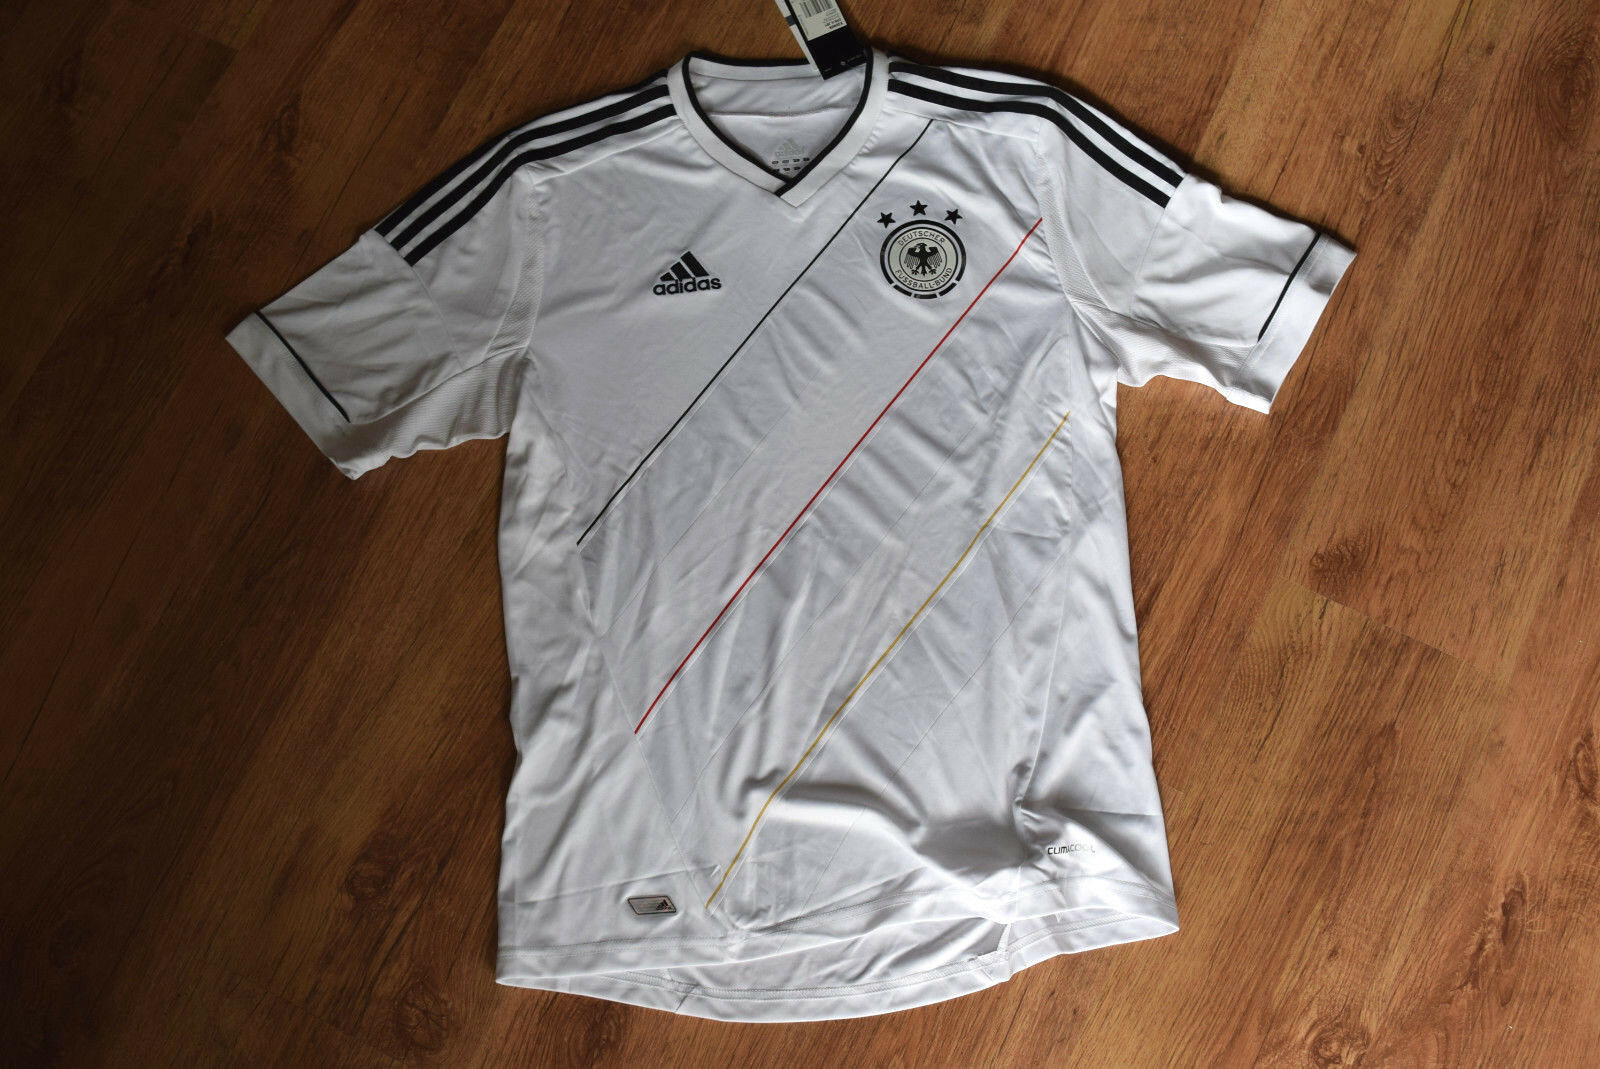 Adidas DFB Heim Trikot   L XL XXL  EM 2012-13 Deutschland X20656 H JSY Jersey